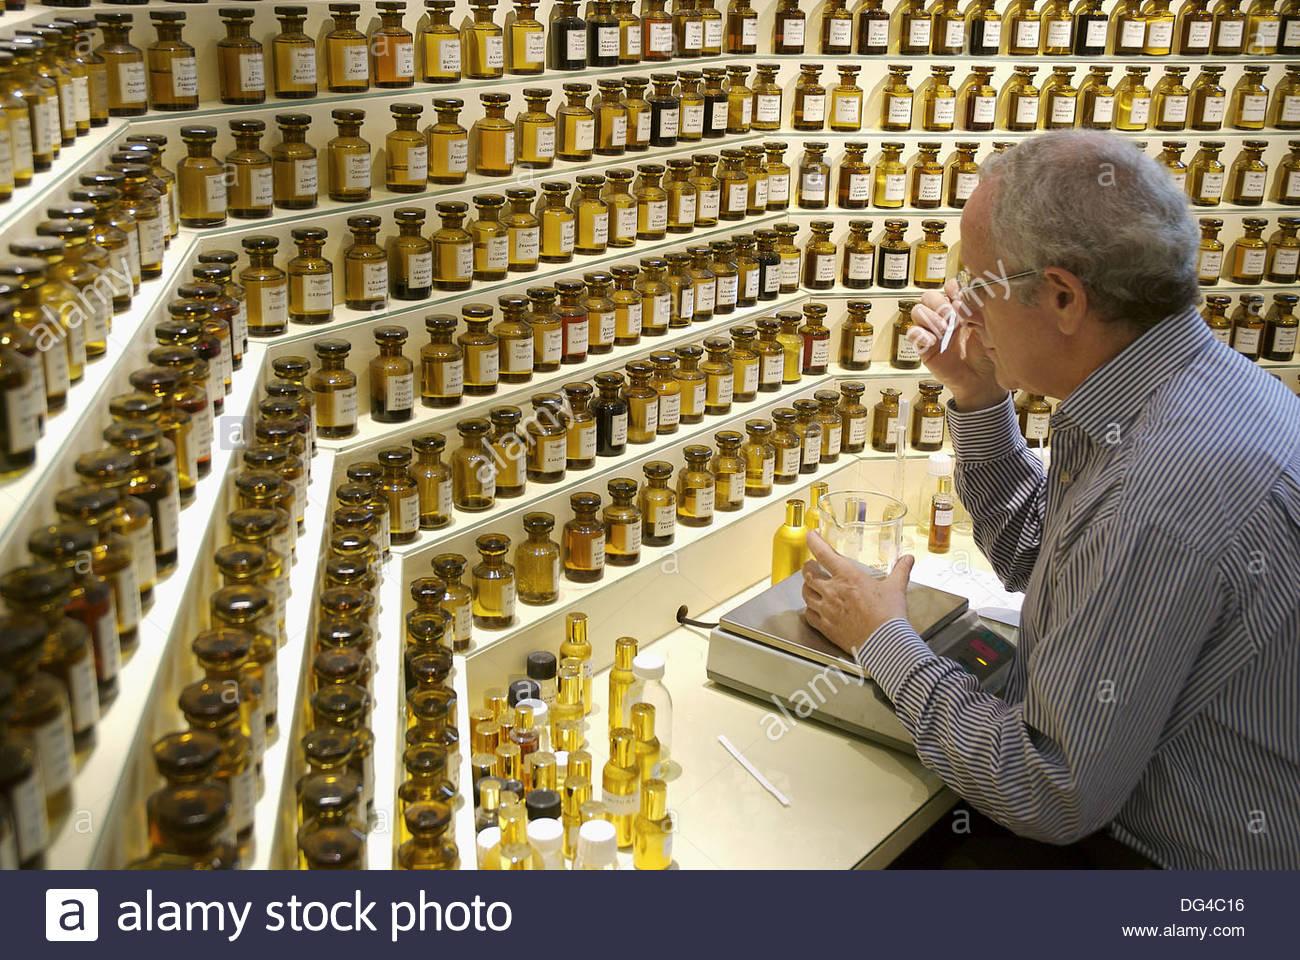 parfumerie-fragonard-grasse-alpes-maritimes-la-france-dg4c16